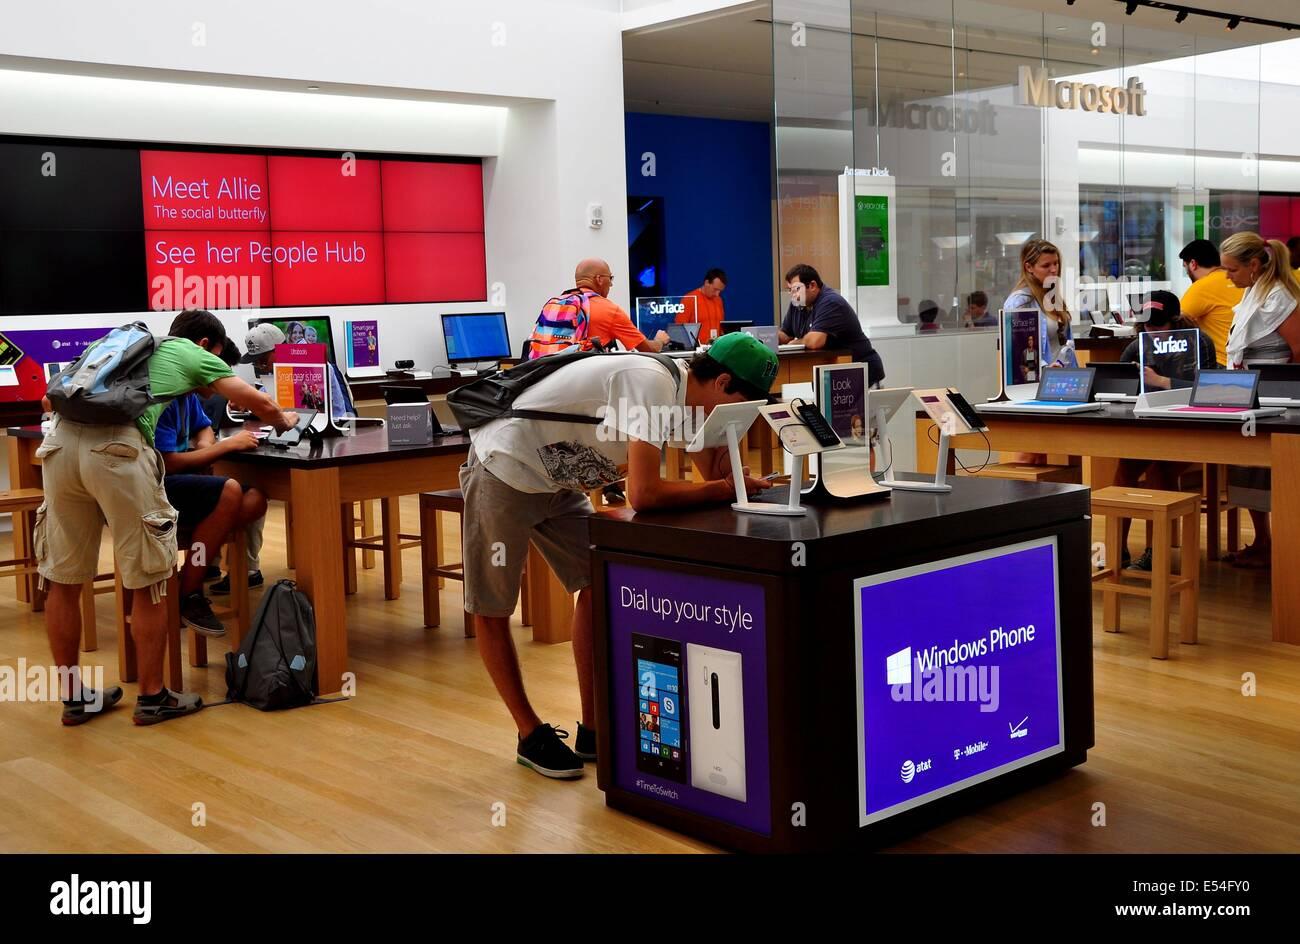 64320b6eddc Microsoft Store Stock Photos   Microsoft Store Stock Images - Alamy